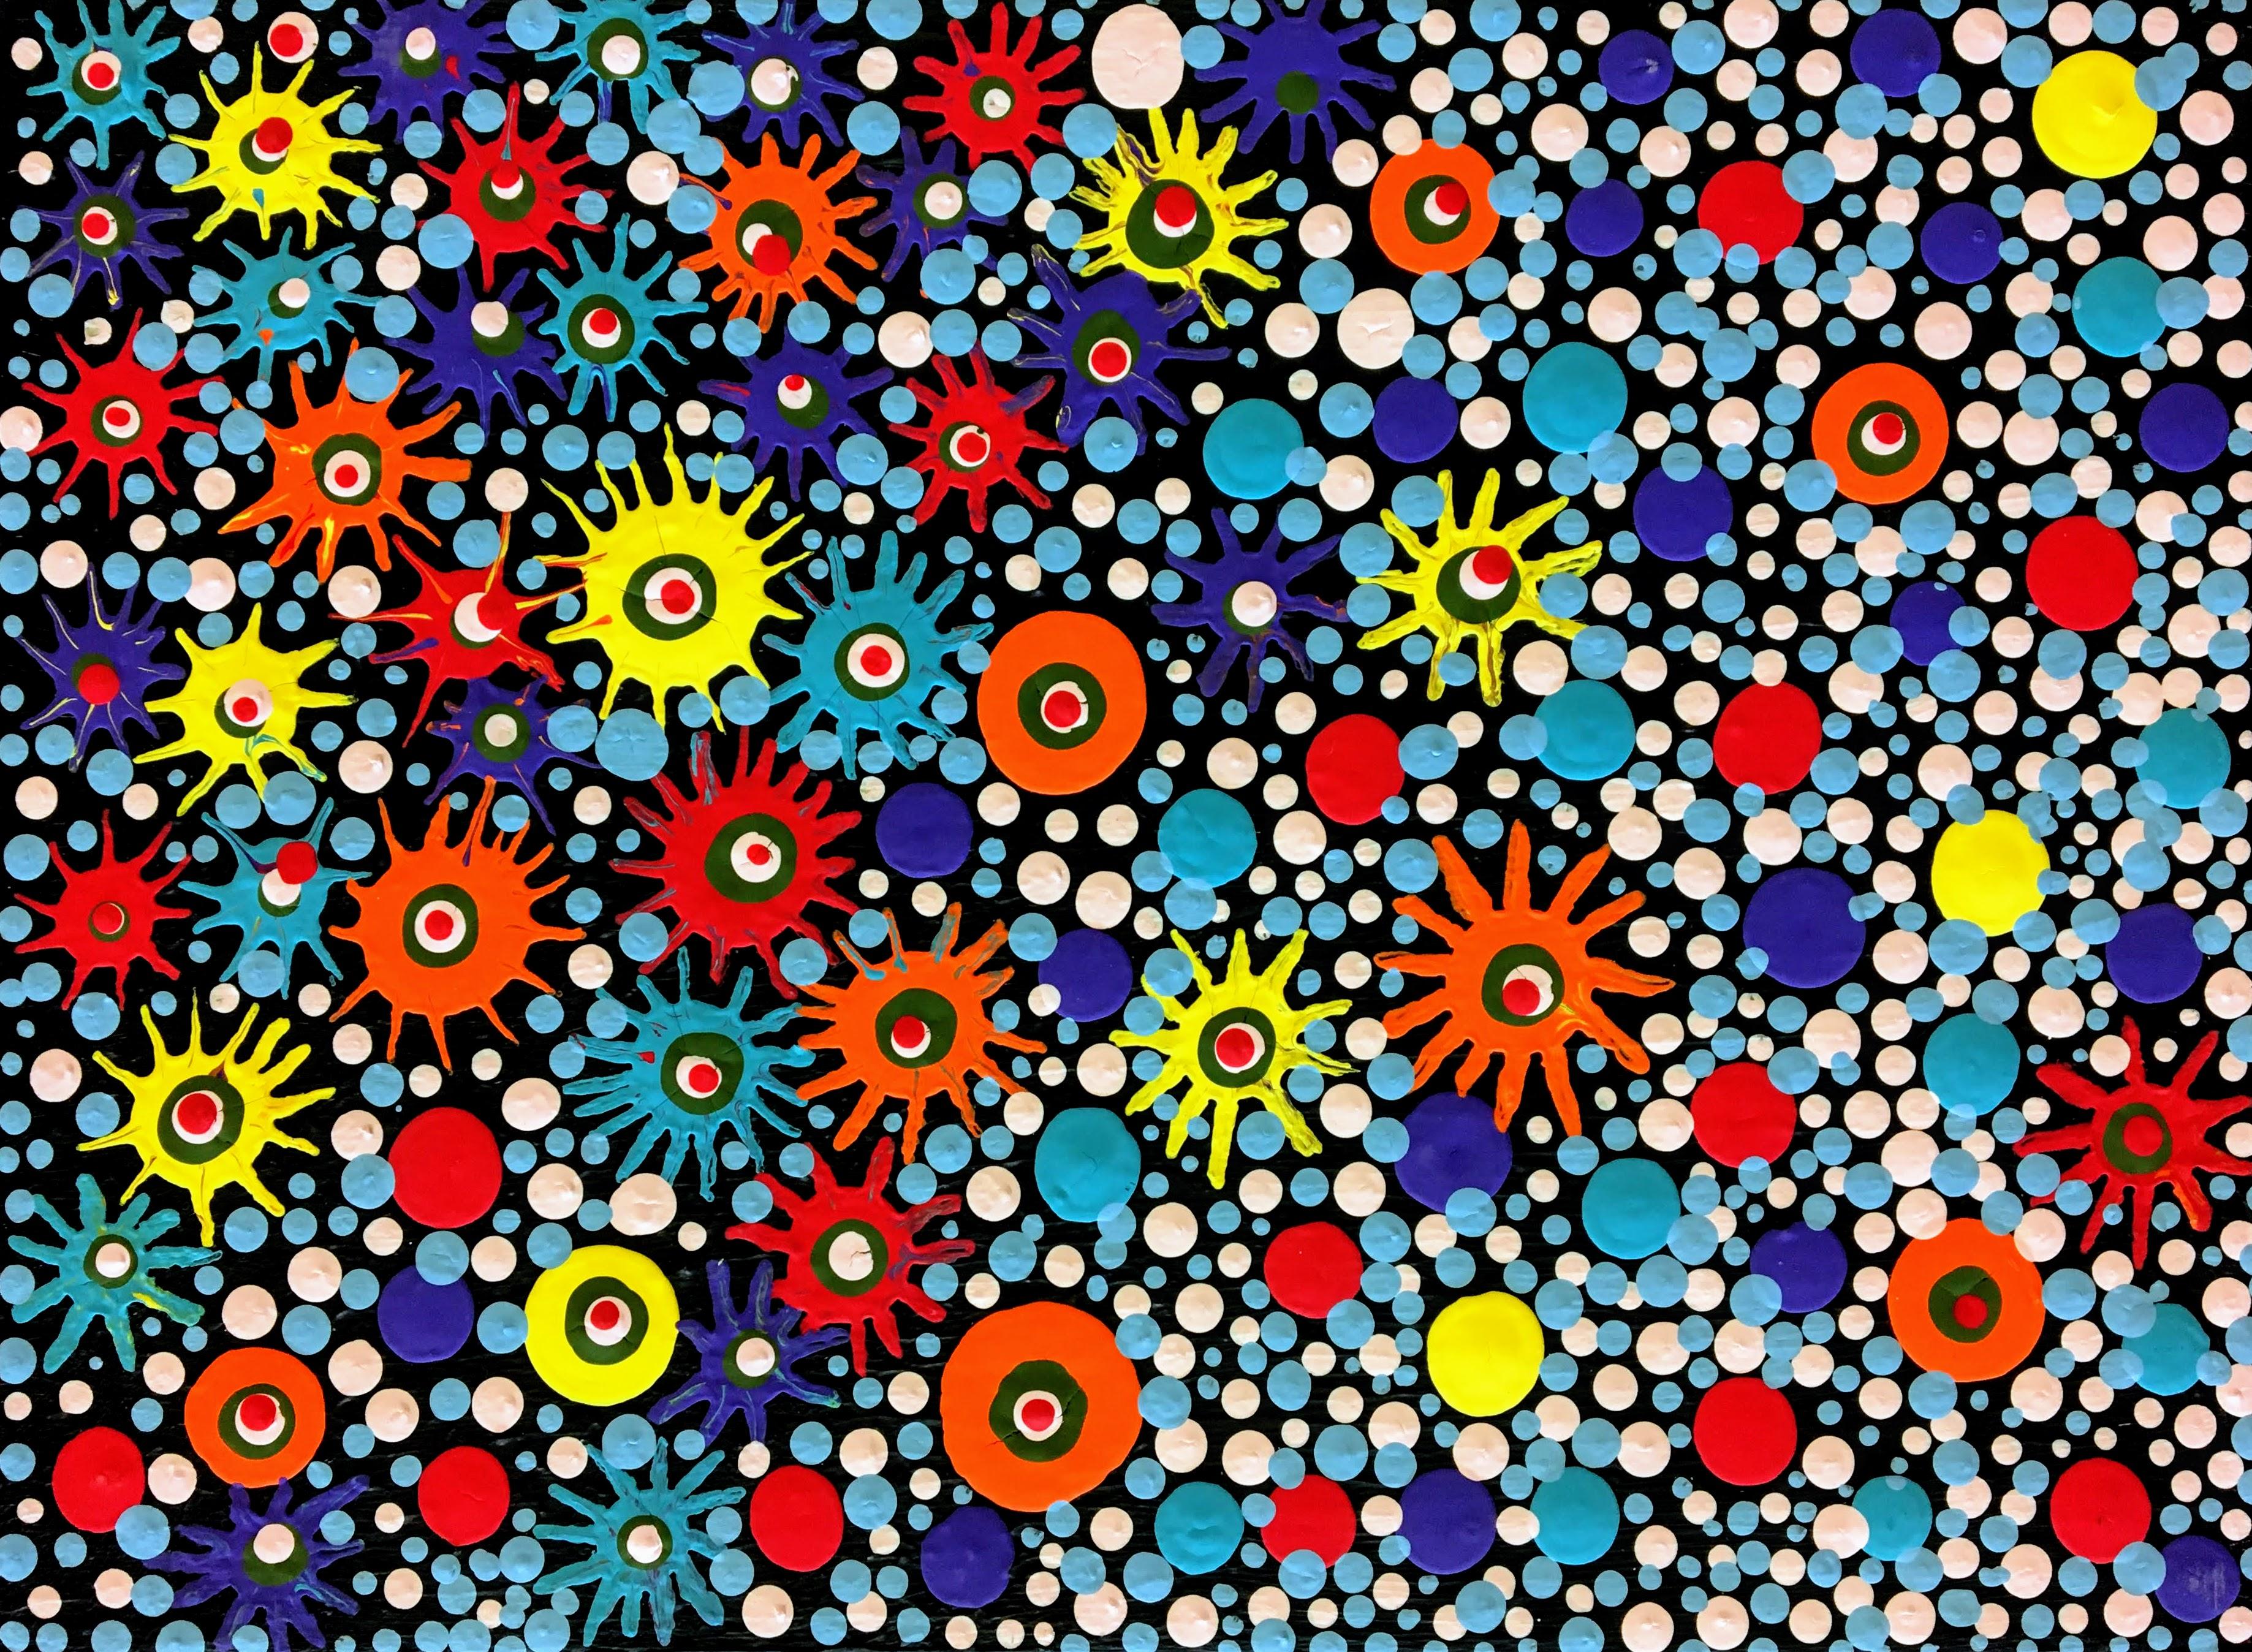 """Starbust Motif"" by Sheila Smith"